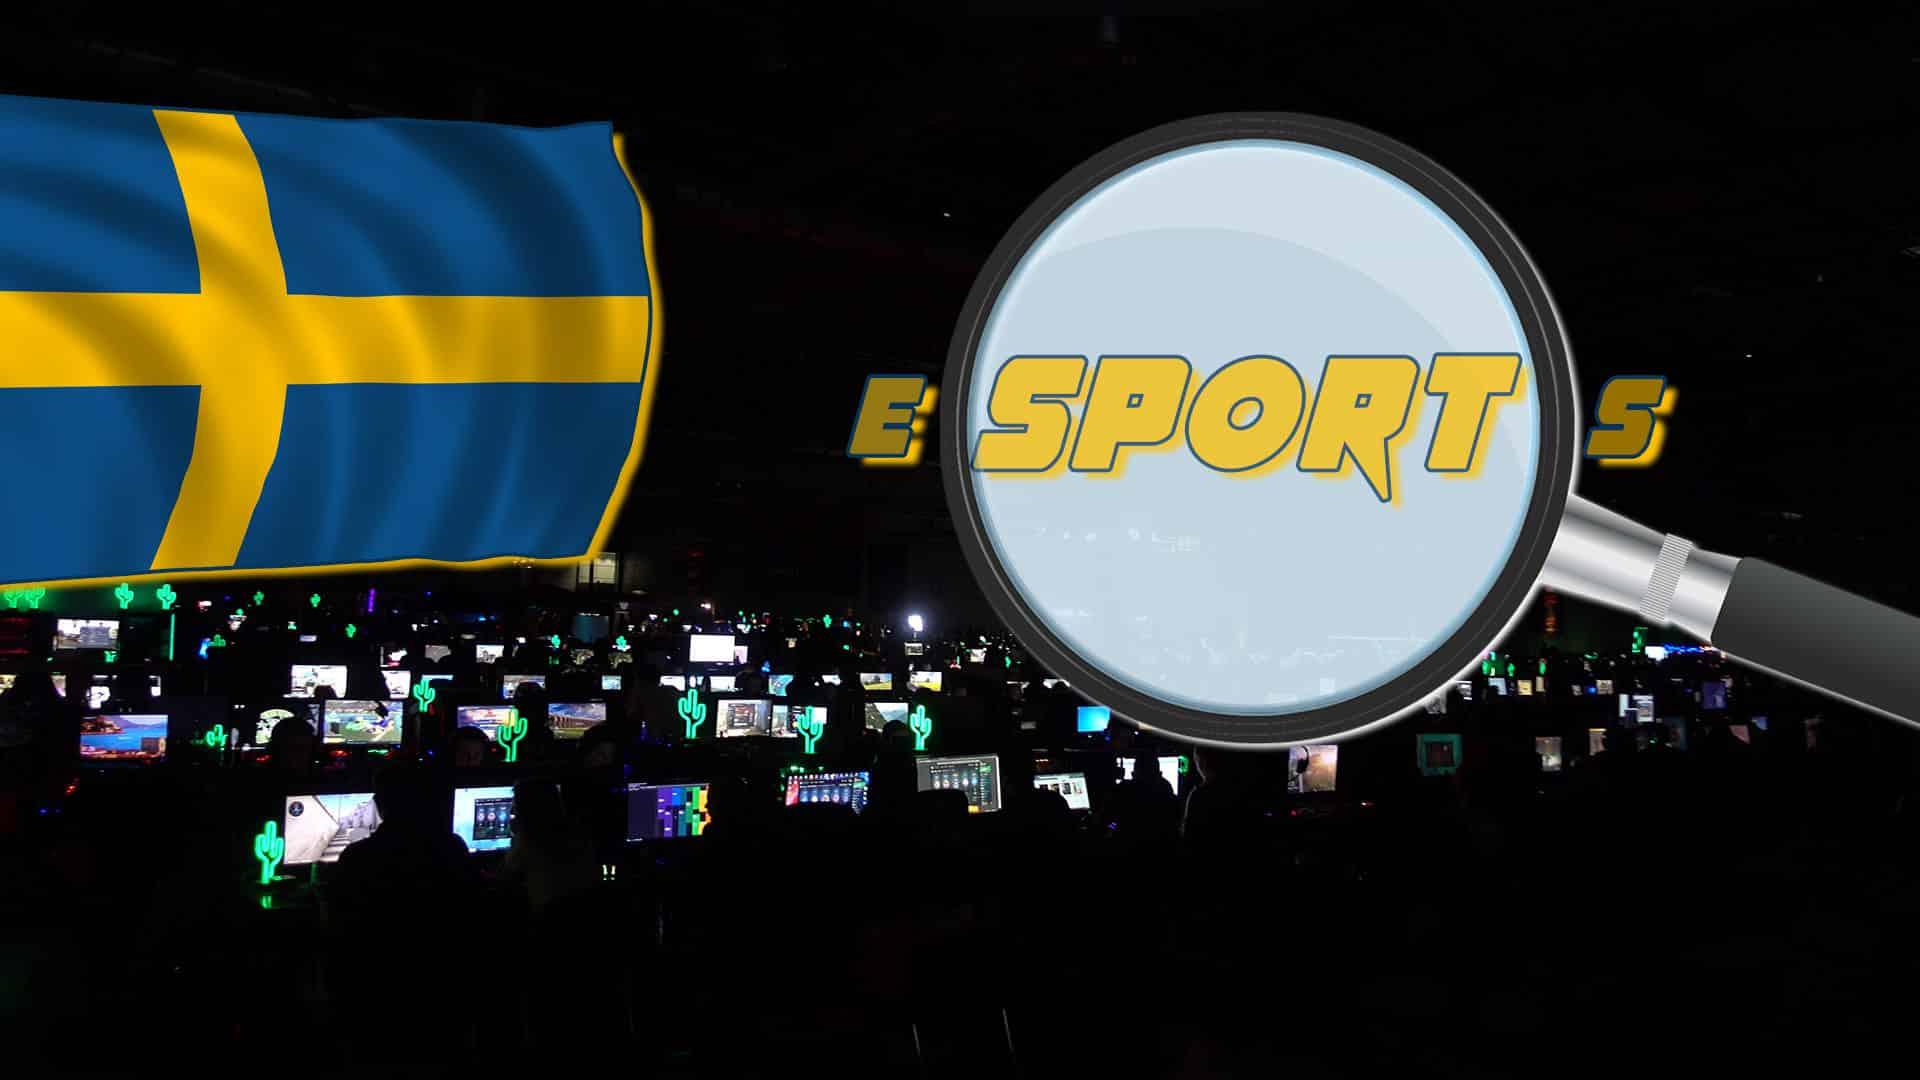 schweden eSport header